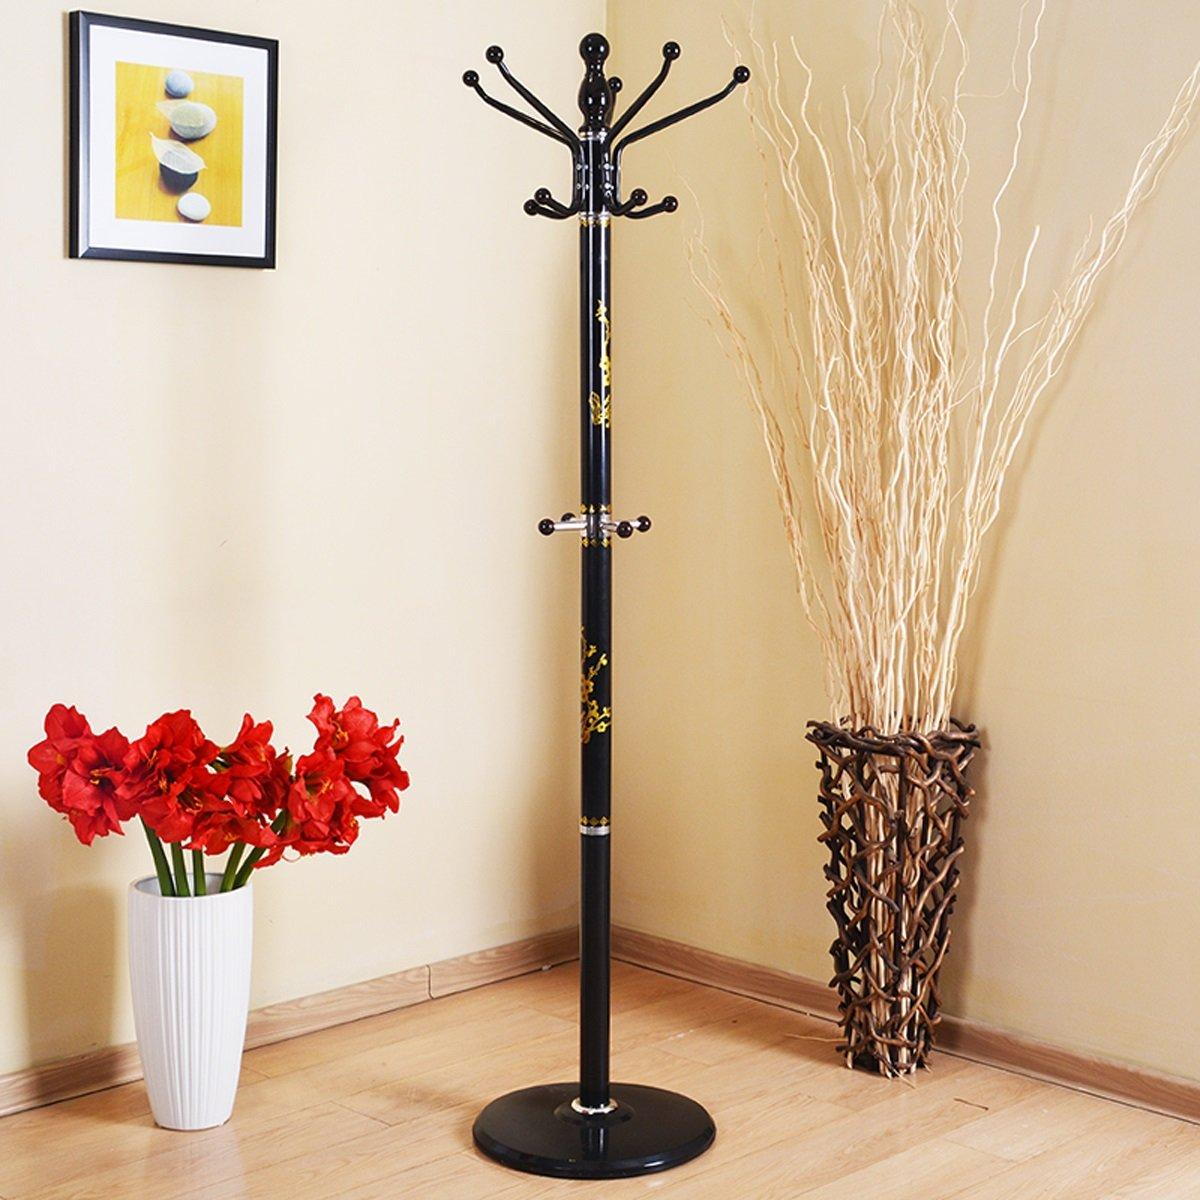 LF Coat rack Perchero para el hogar Percha para el hogar Percha metálica extraíble Perchero Colgante Simple (180 * 40cm) Blanco (Color : Negro)